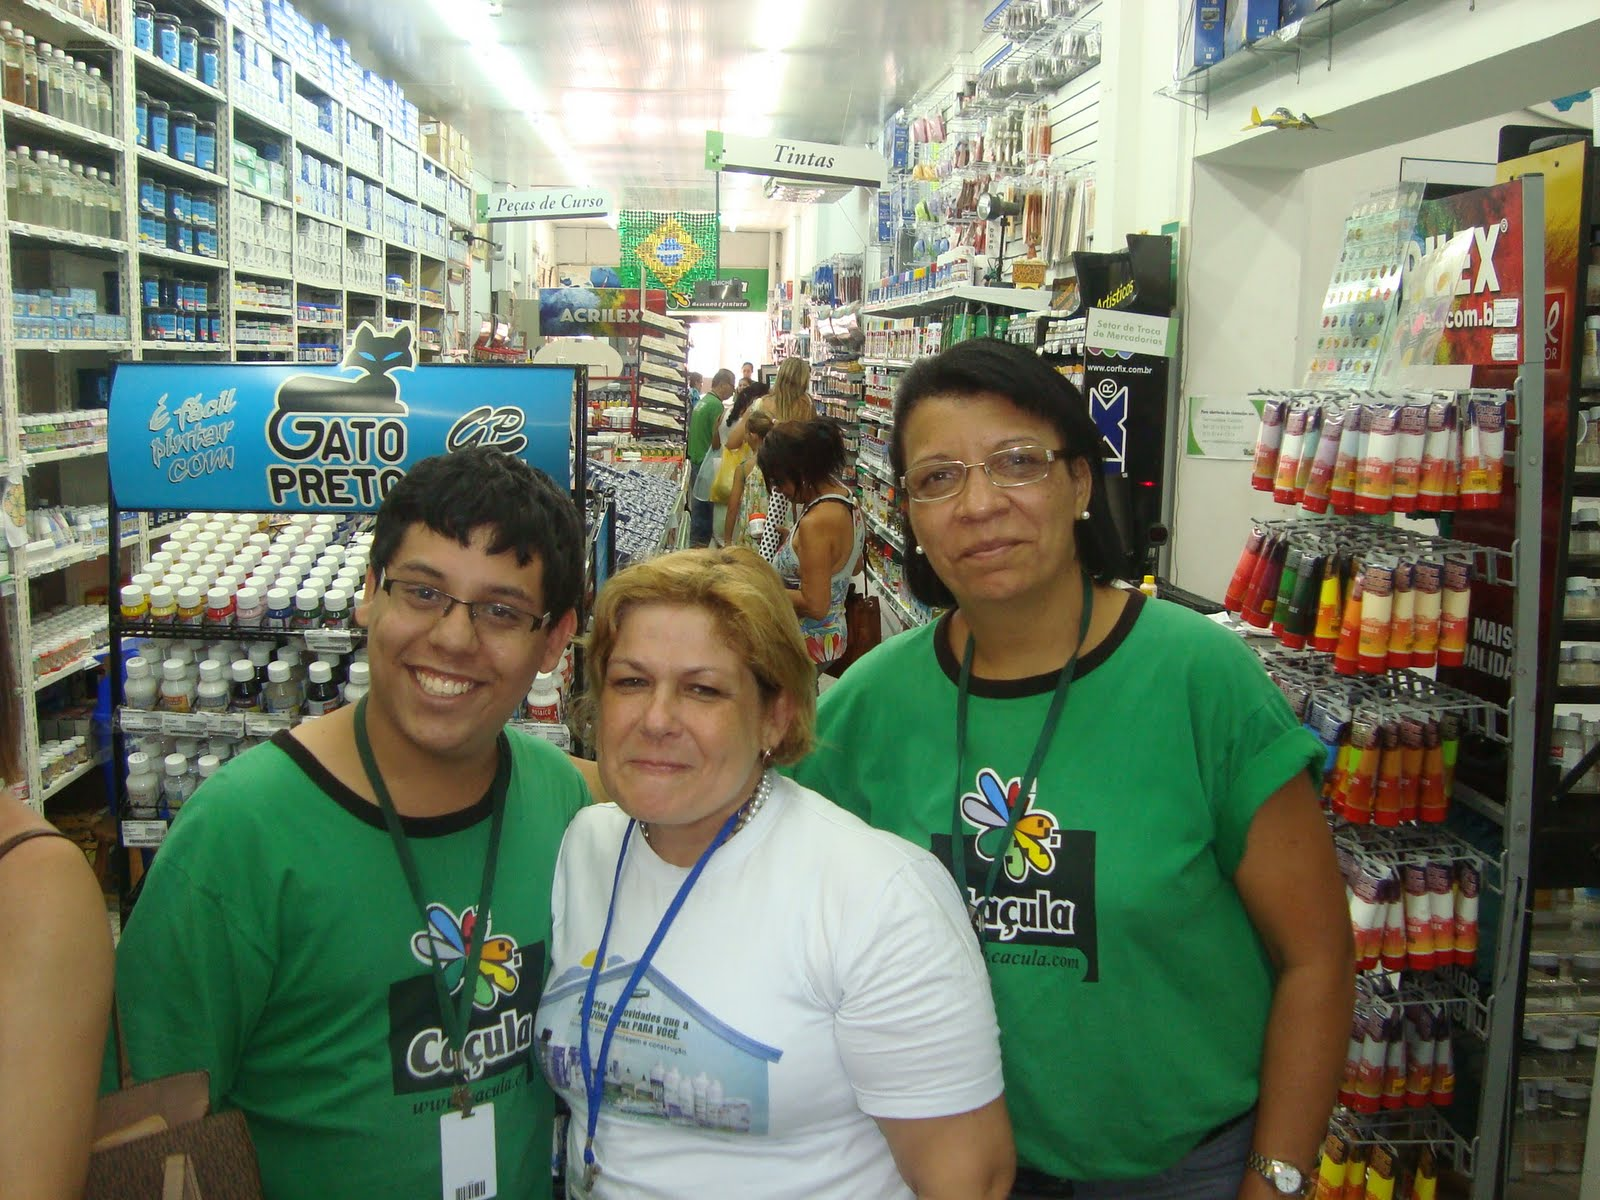 b72cbcf2efc NINA RODRIGUEZ  DEMONSTRAÇÃO DA COLA aMAZONONAS NA LOJA CAÇULA RUA ...